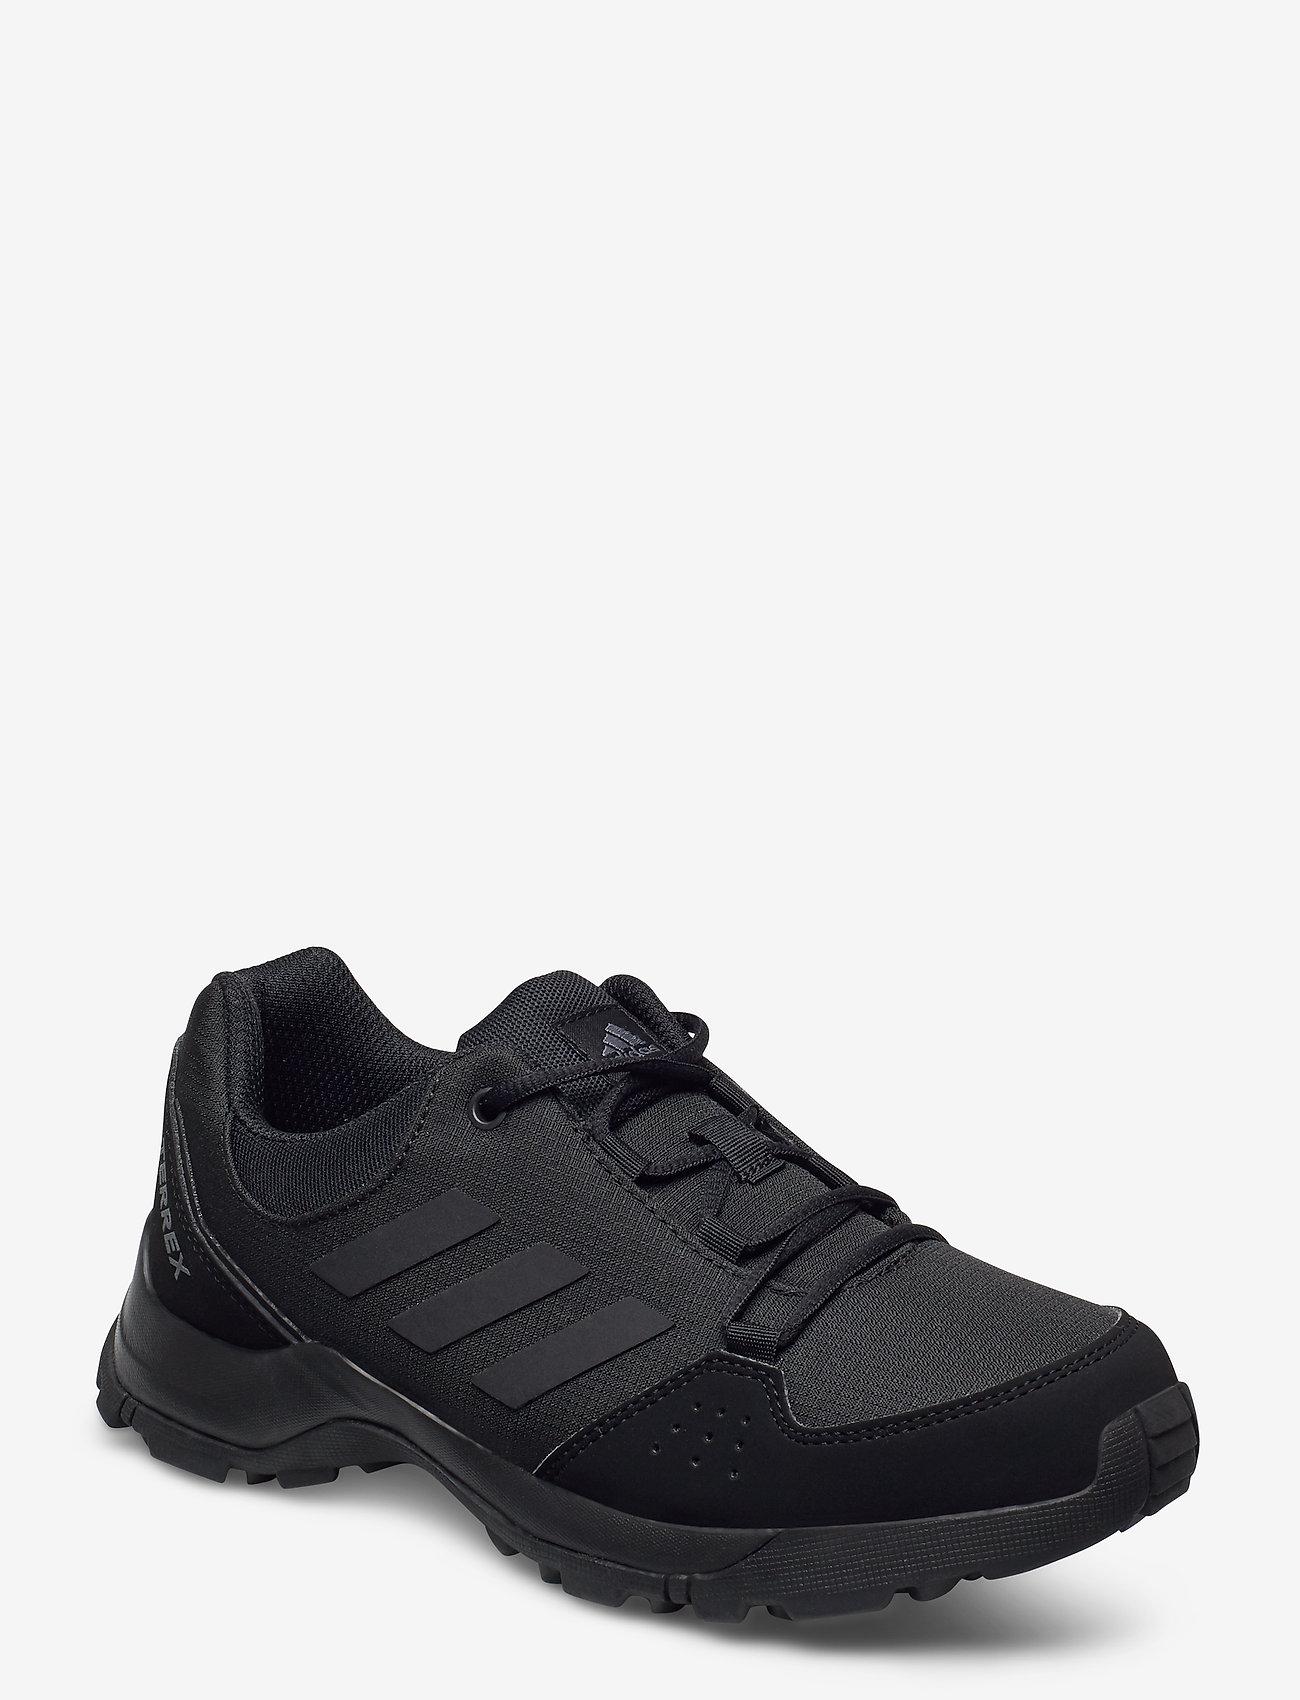 adidas Performance - Terrex Hyperhiker Low Hiking - trainingsschuhe - cblack/cblack/grefiv - 0